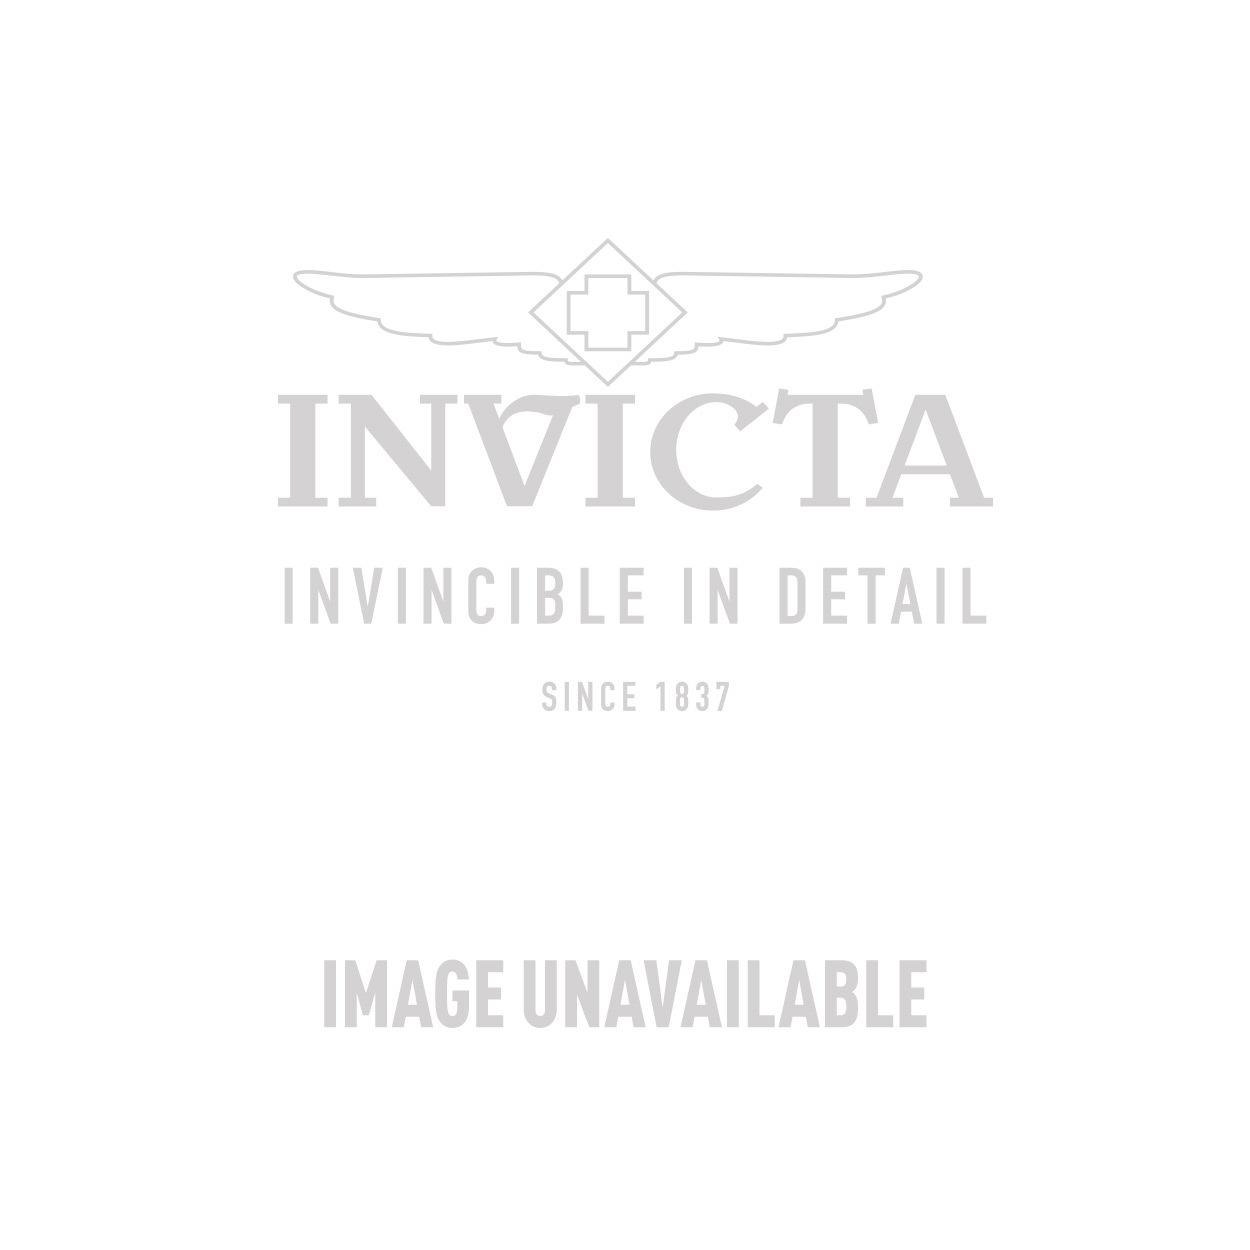 Invicta  Bolt Zeus  Quartz Watch - Black, Stainless Steel case with Steel, Black tone Stainless Steel, Polyurethane band - Model 12298